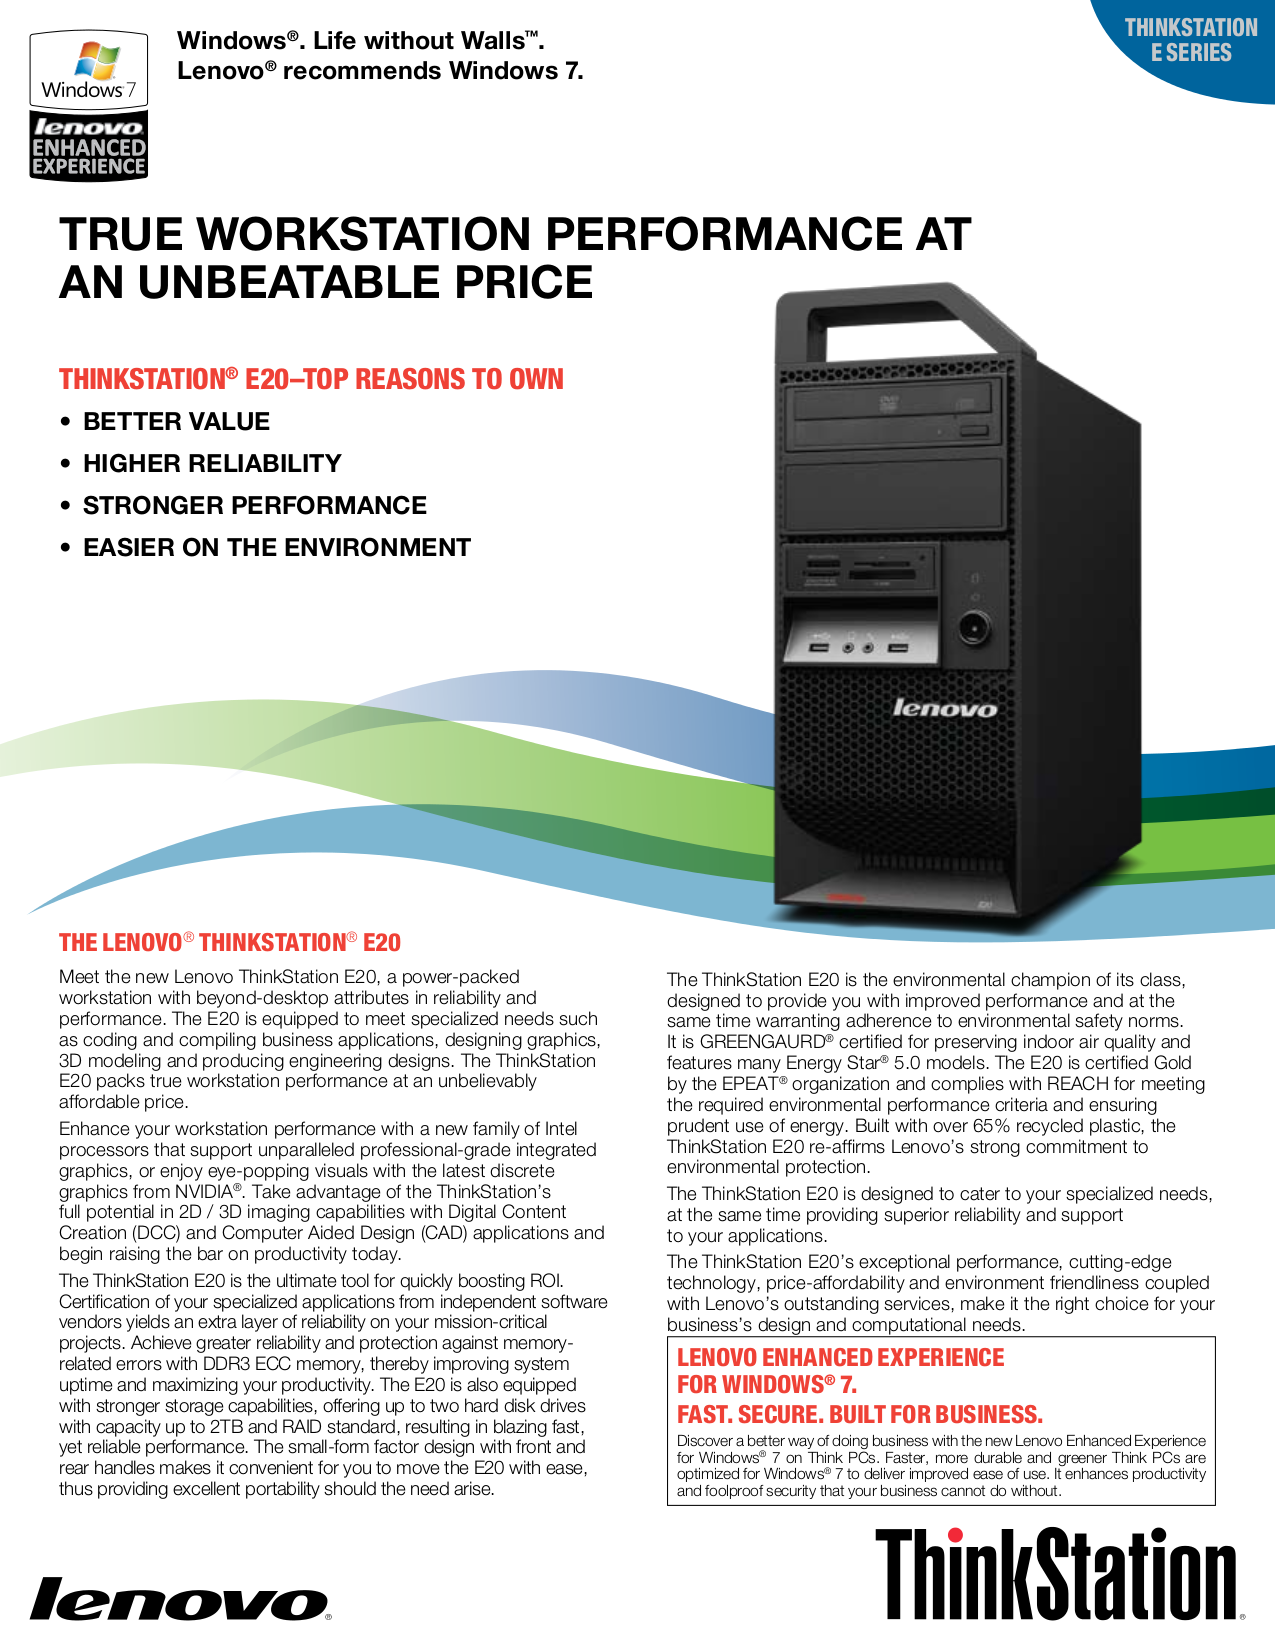 pdf for Lenovo Desktop ThinkStation E20 4220 manual